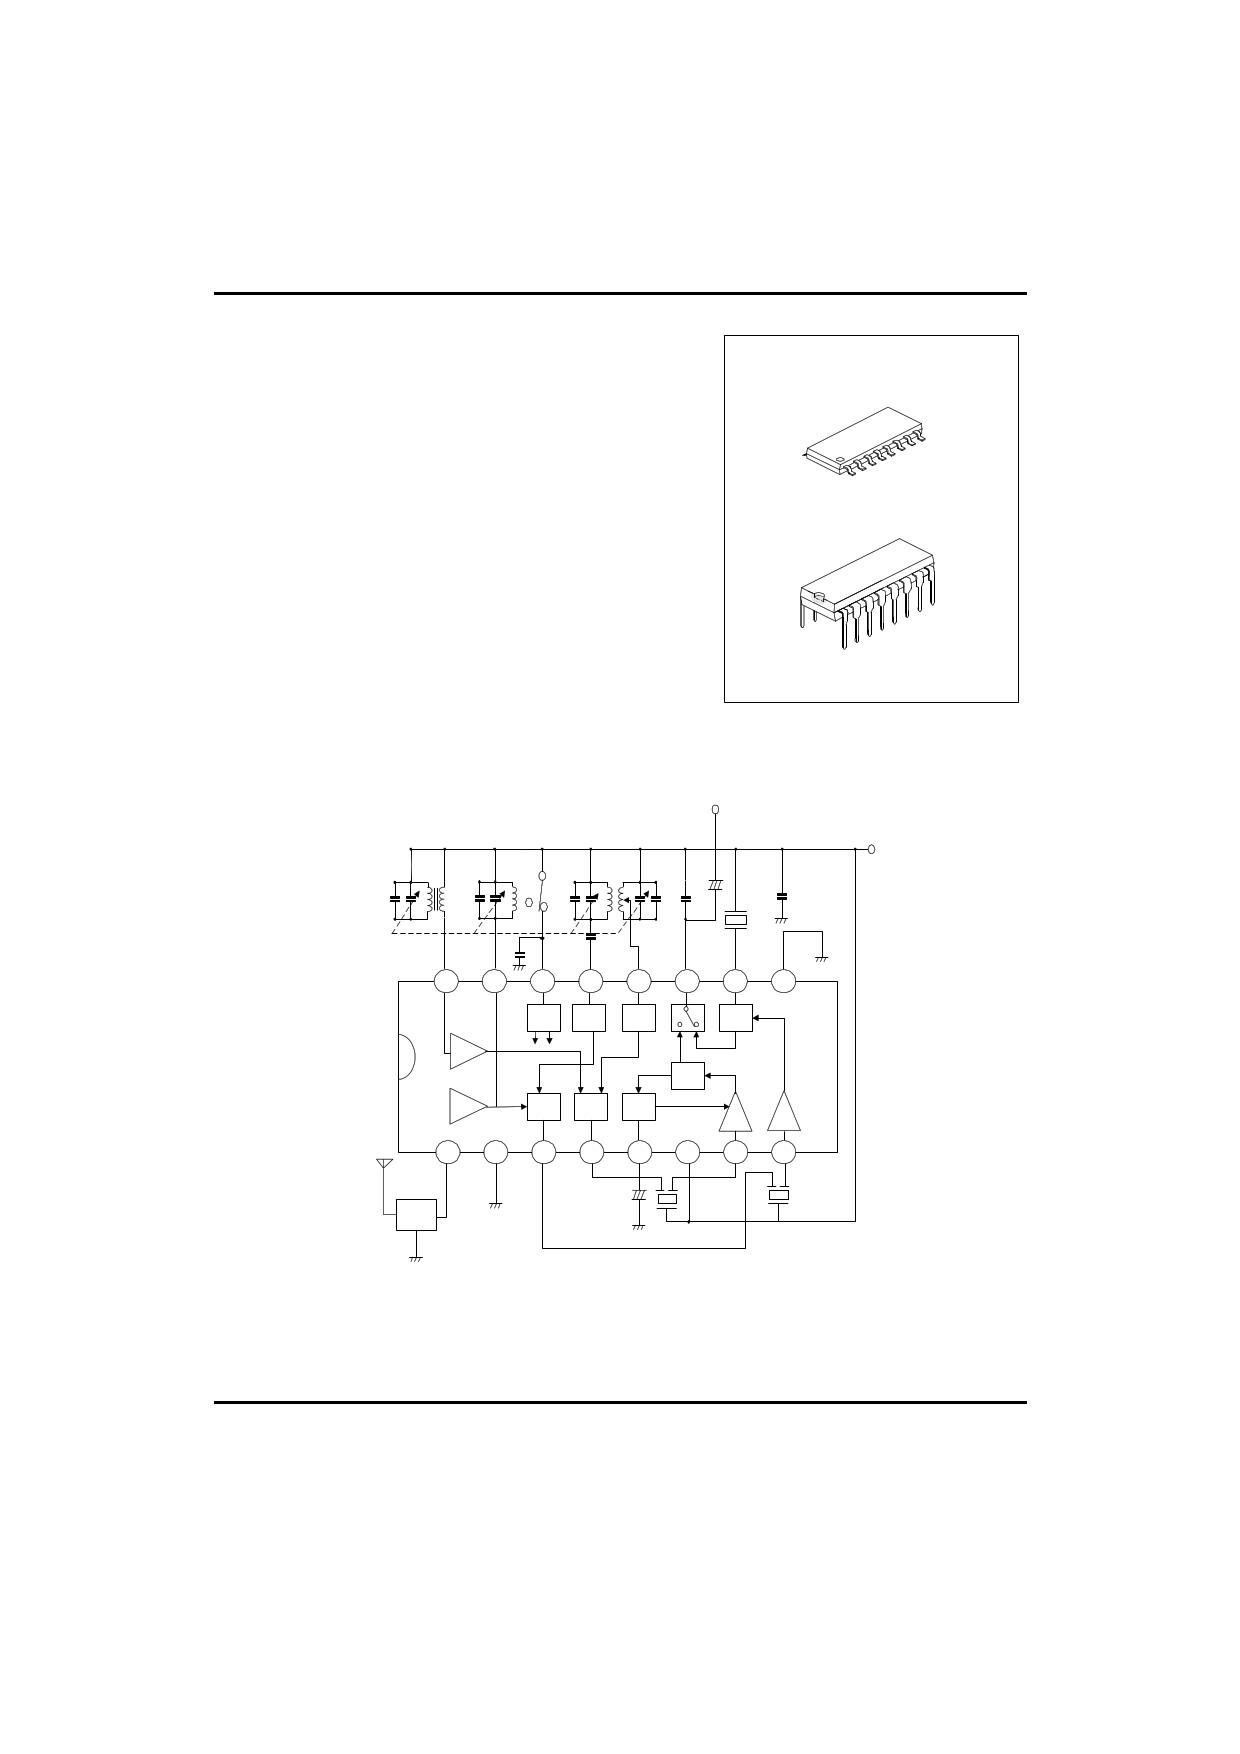 utcta2003 datasheet pdf   pinout    fm radio ic